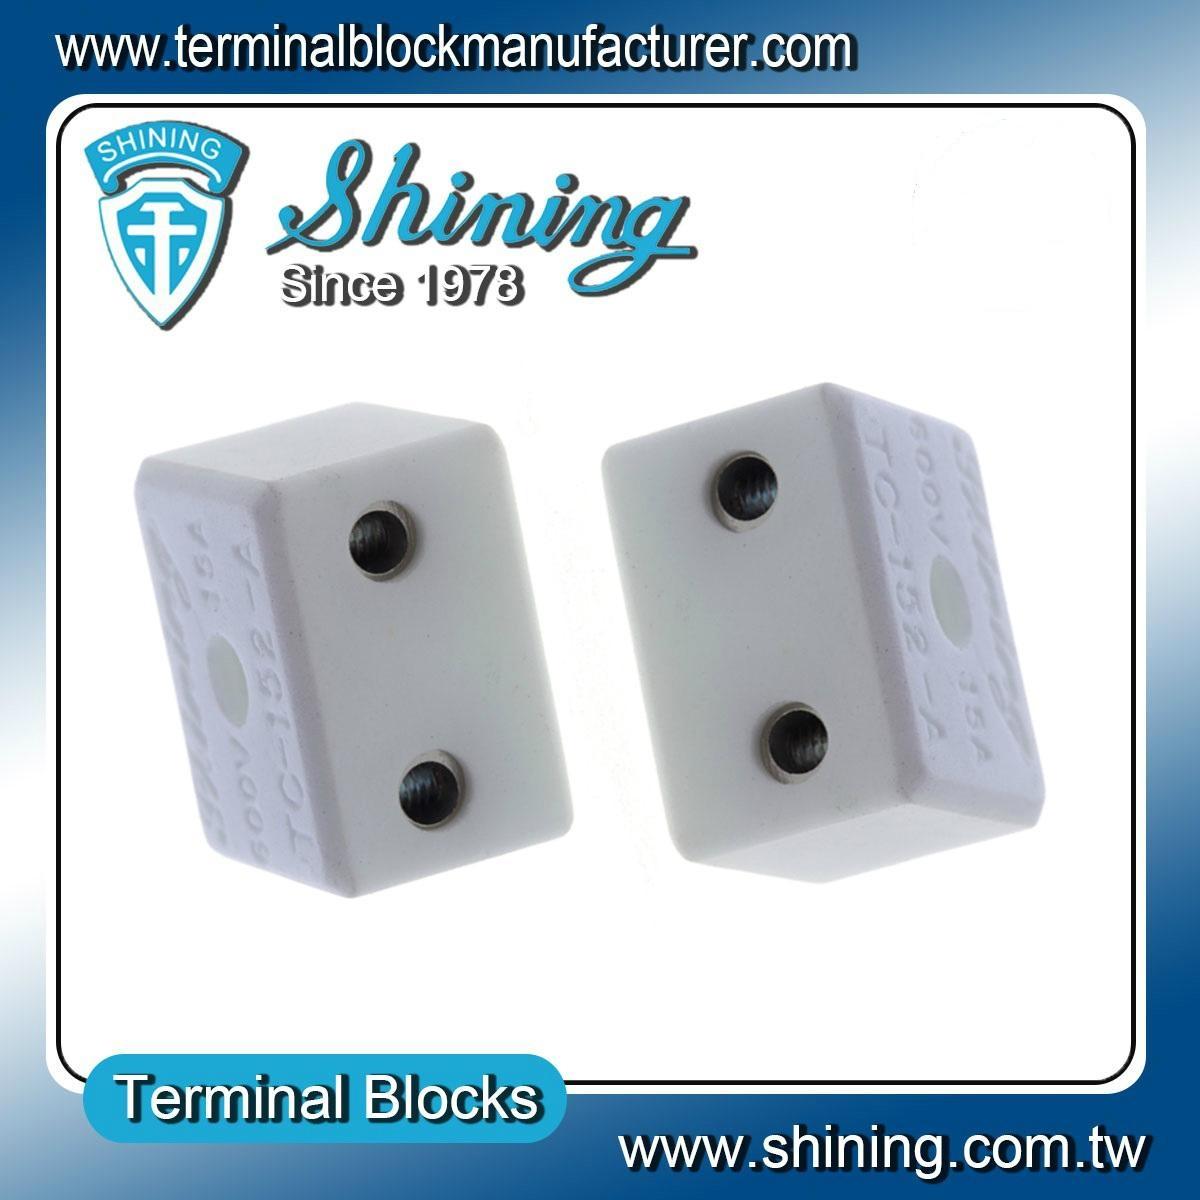 TC-202-A 陶瓷端子台 Ceramic Terminal Block 6